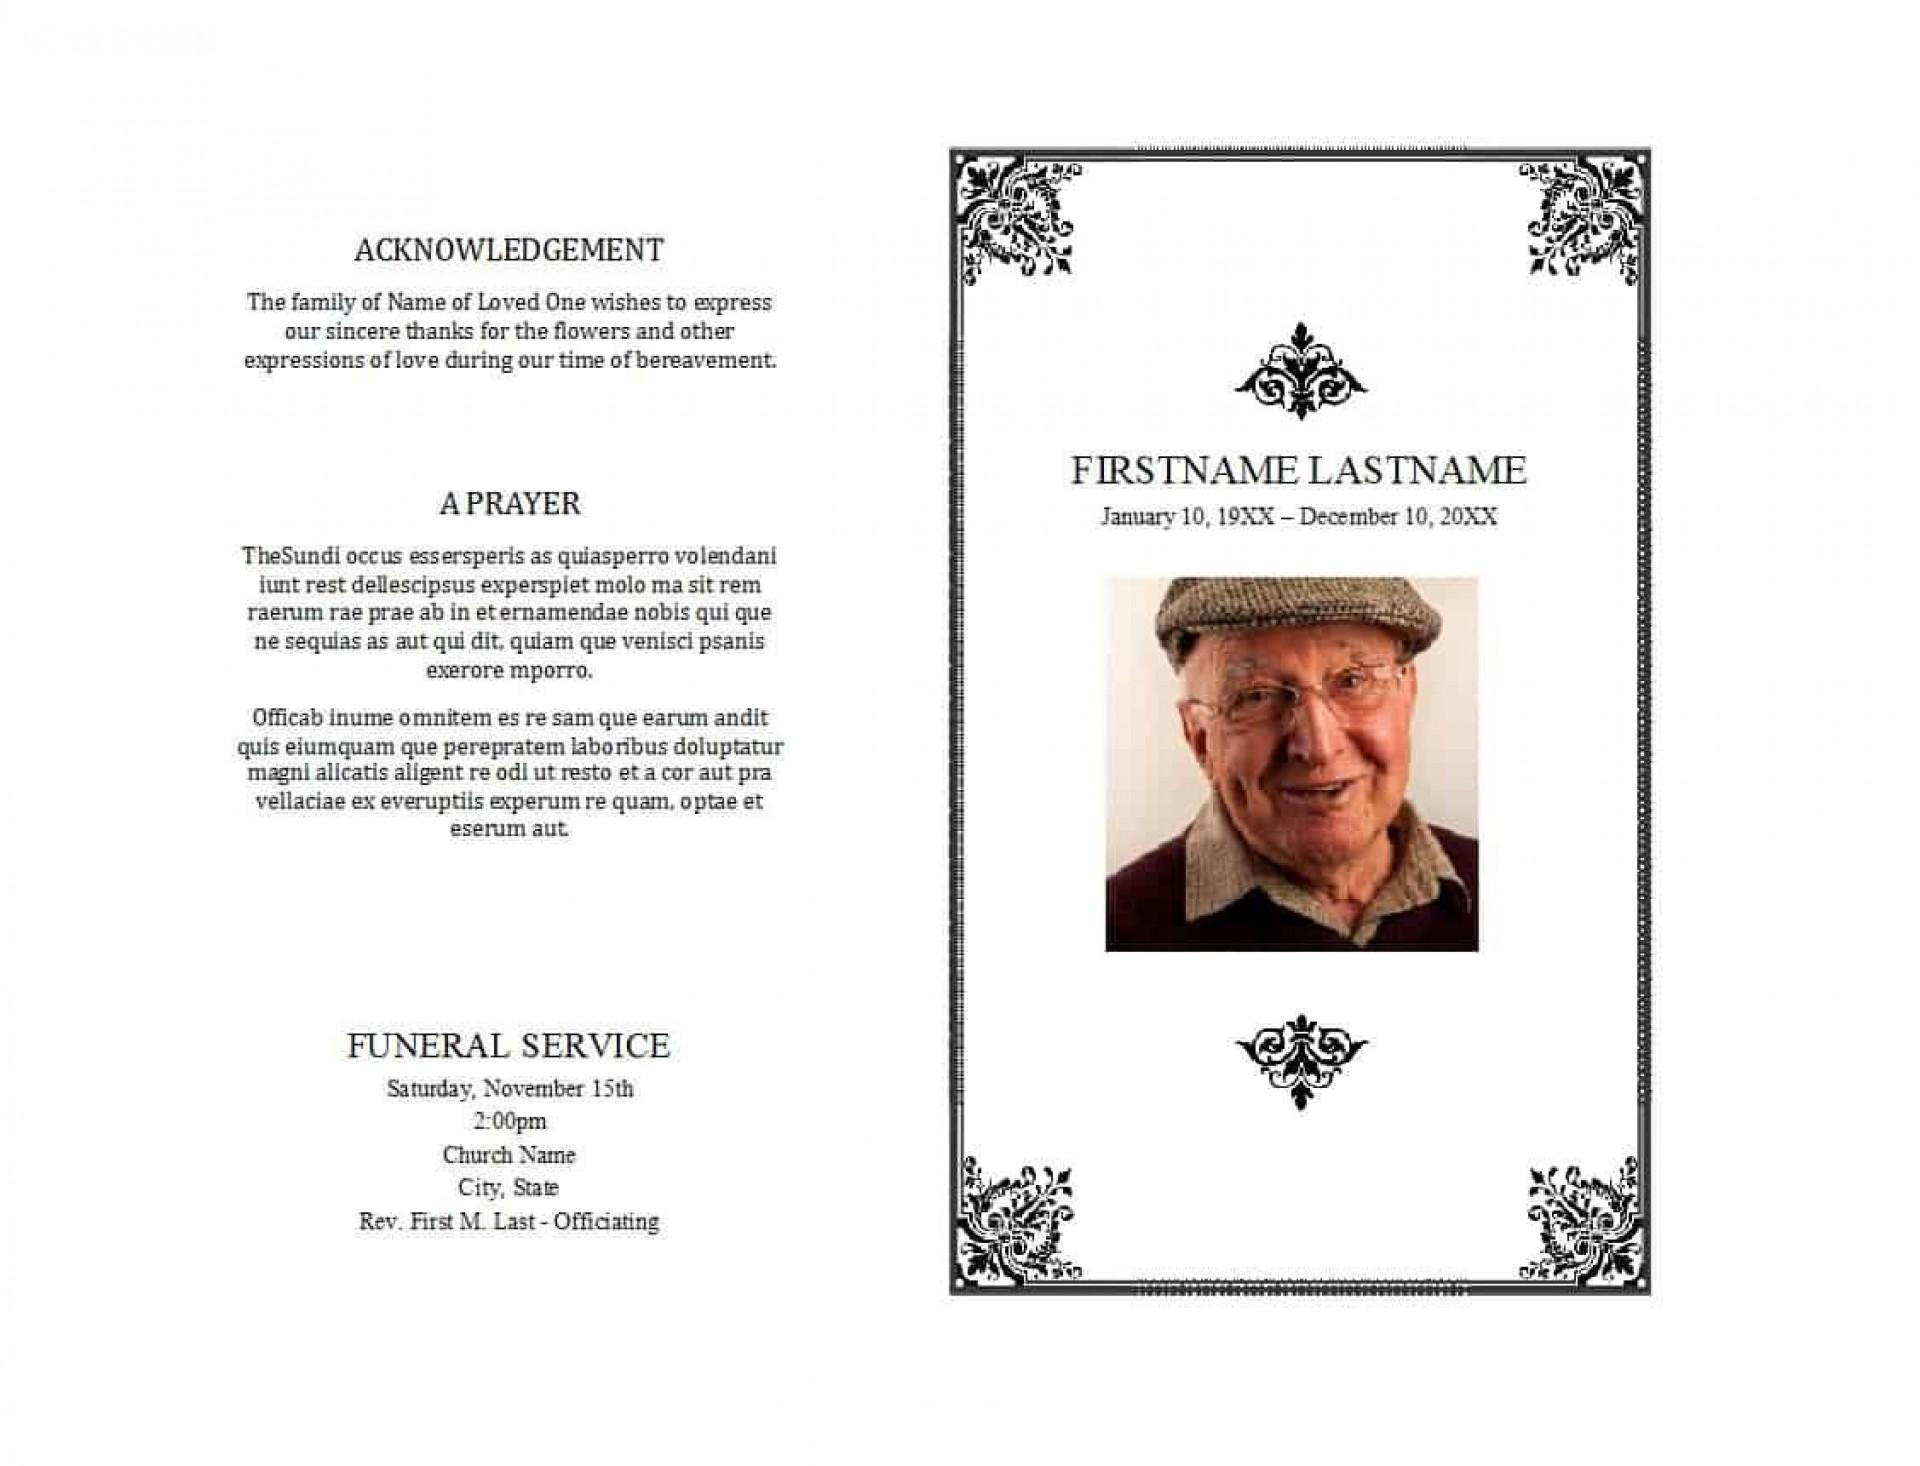 005 Rare Simple Funeral Program Template Free Image  Download1920